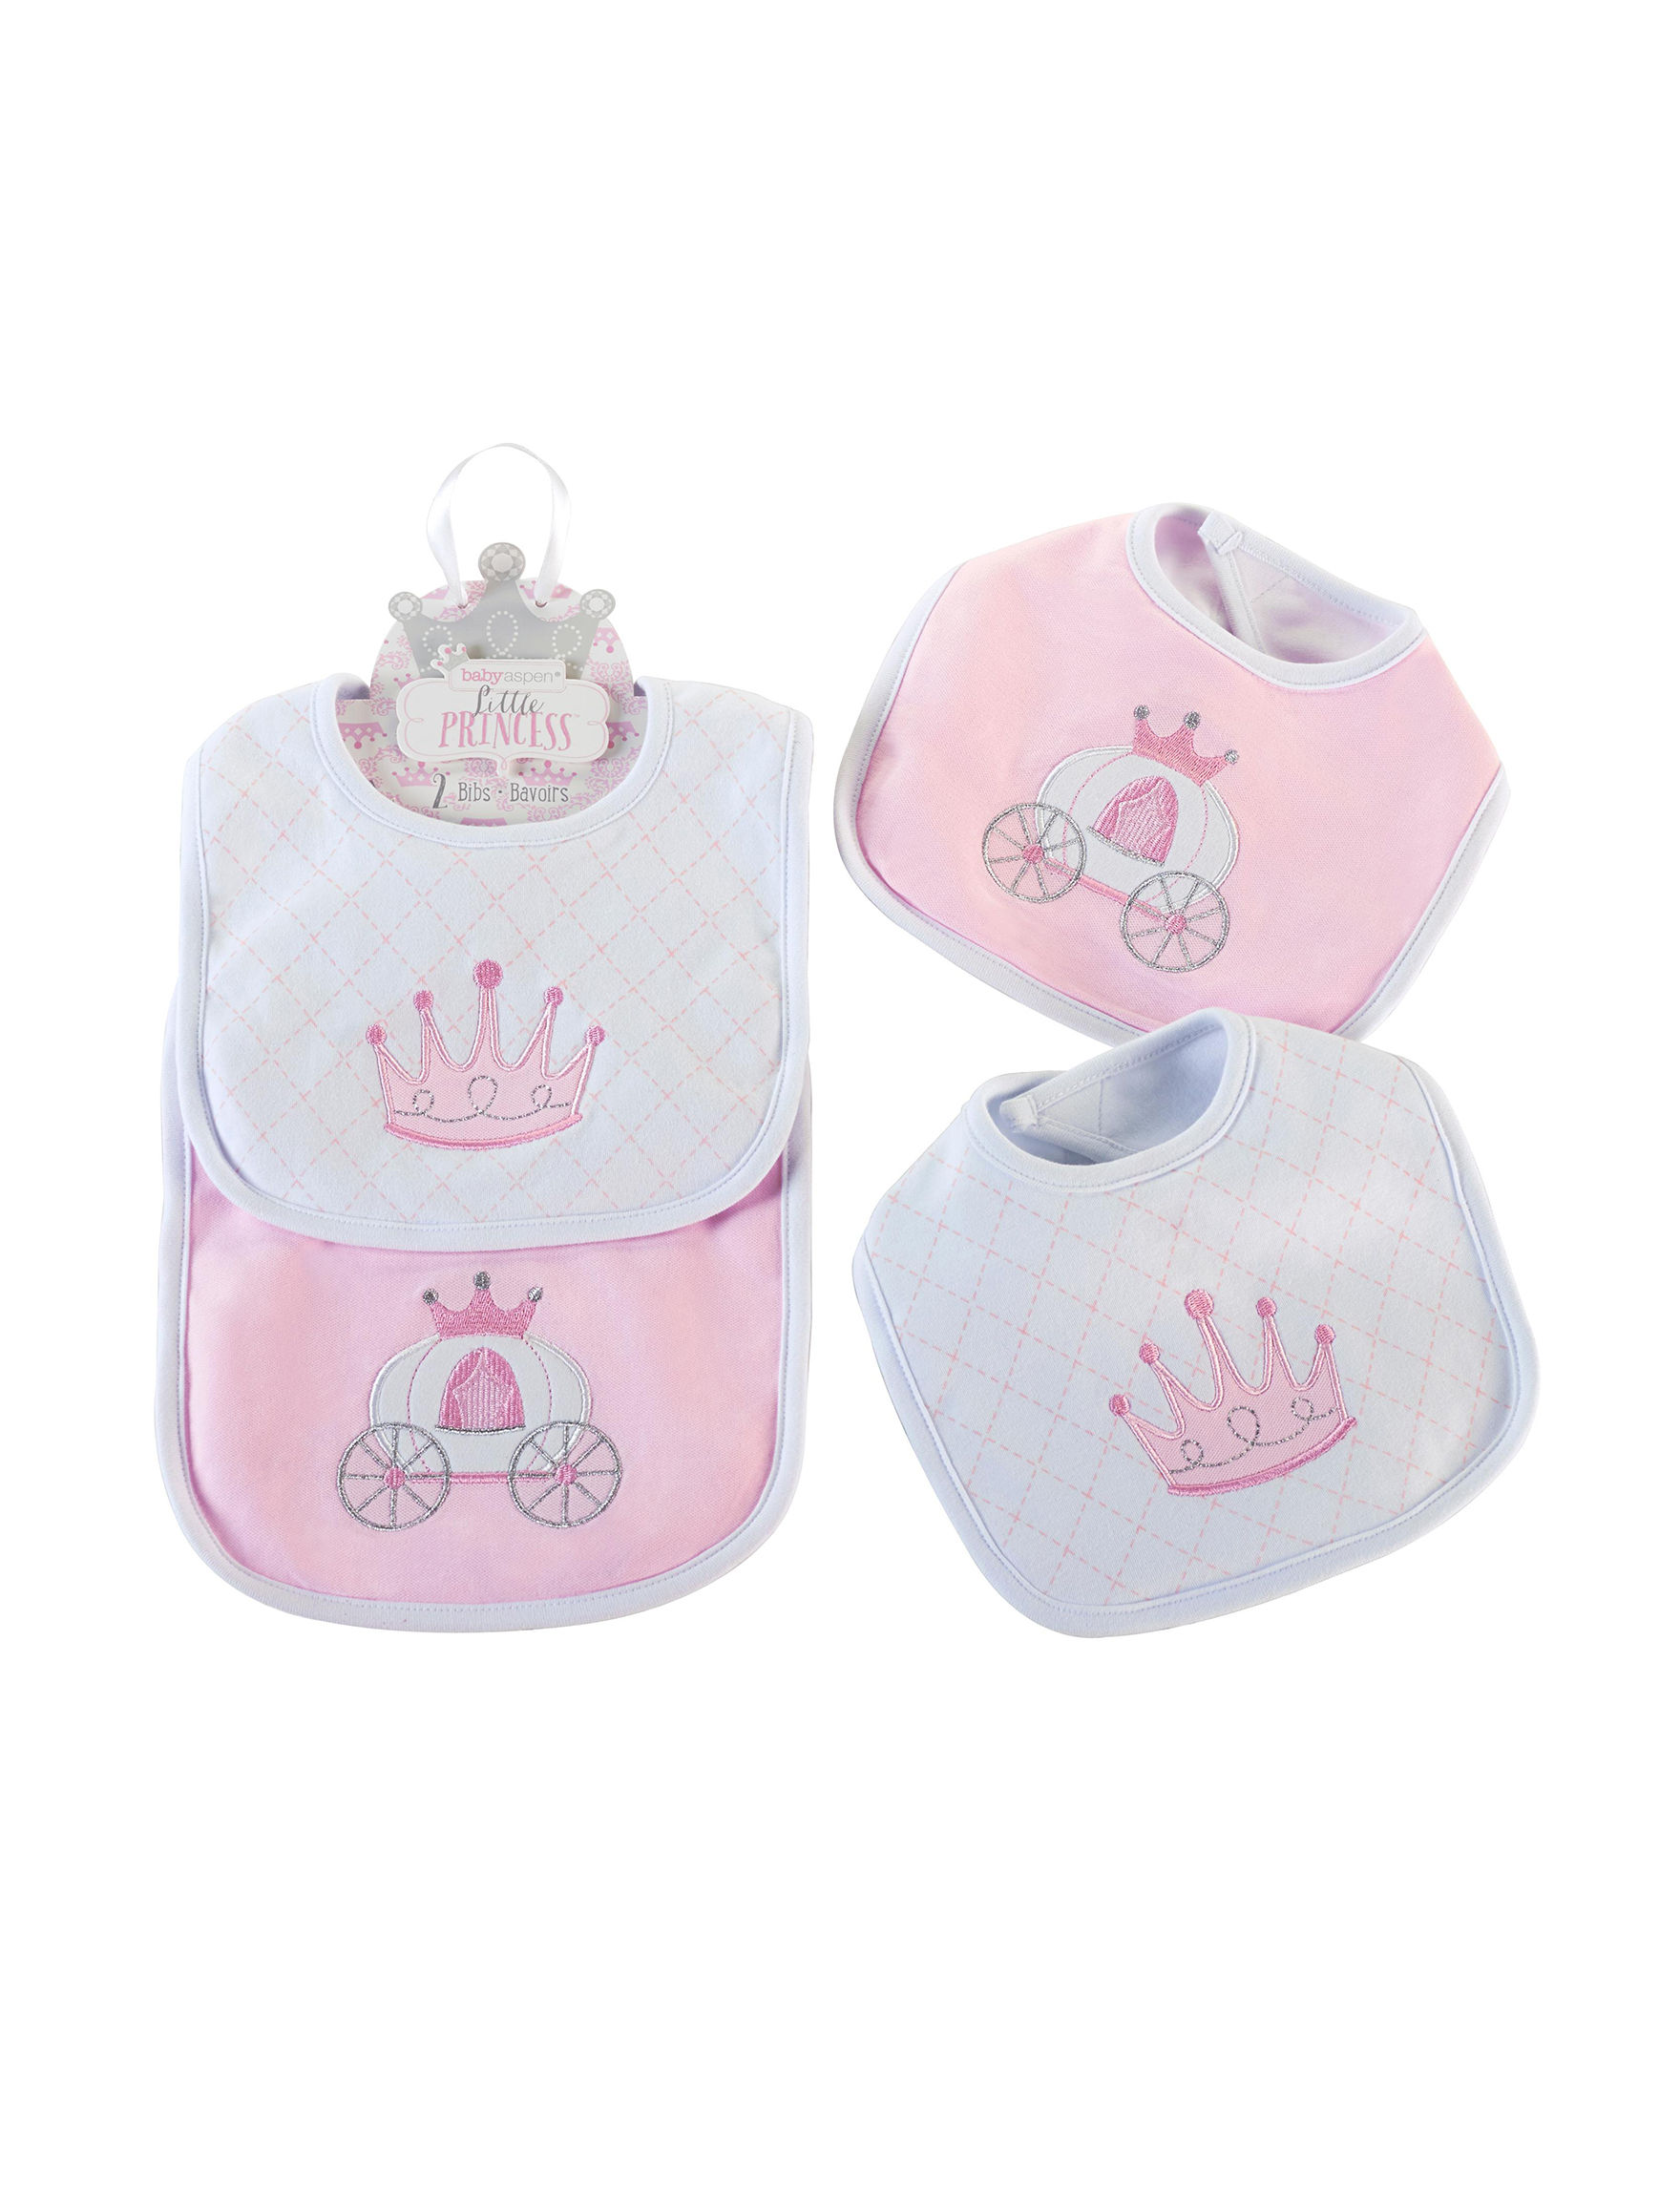 Baby Aspen Pink / White Bibs & Burp Cloths